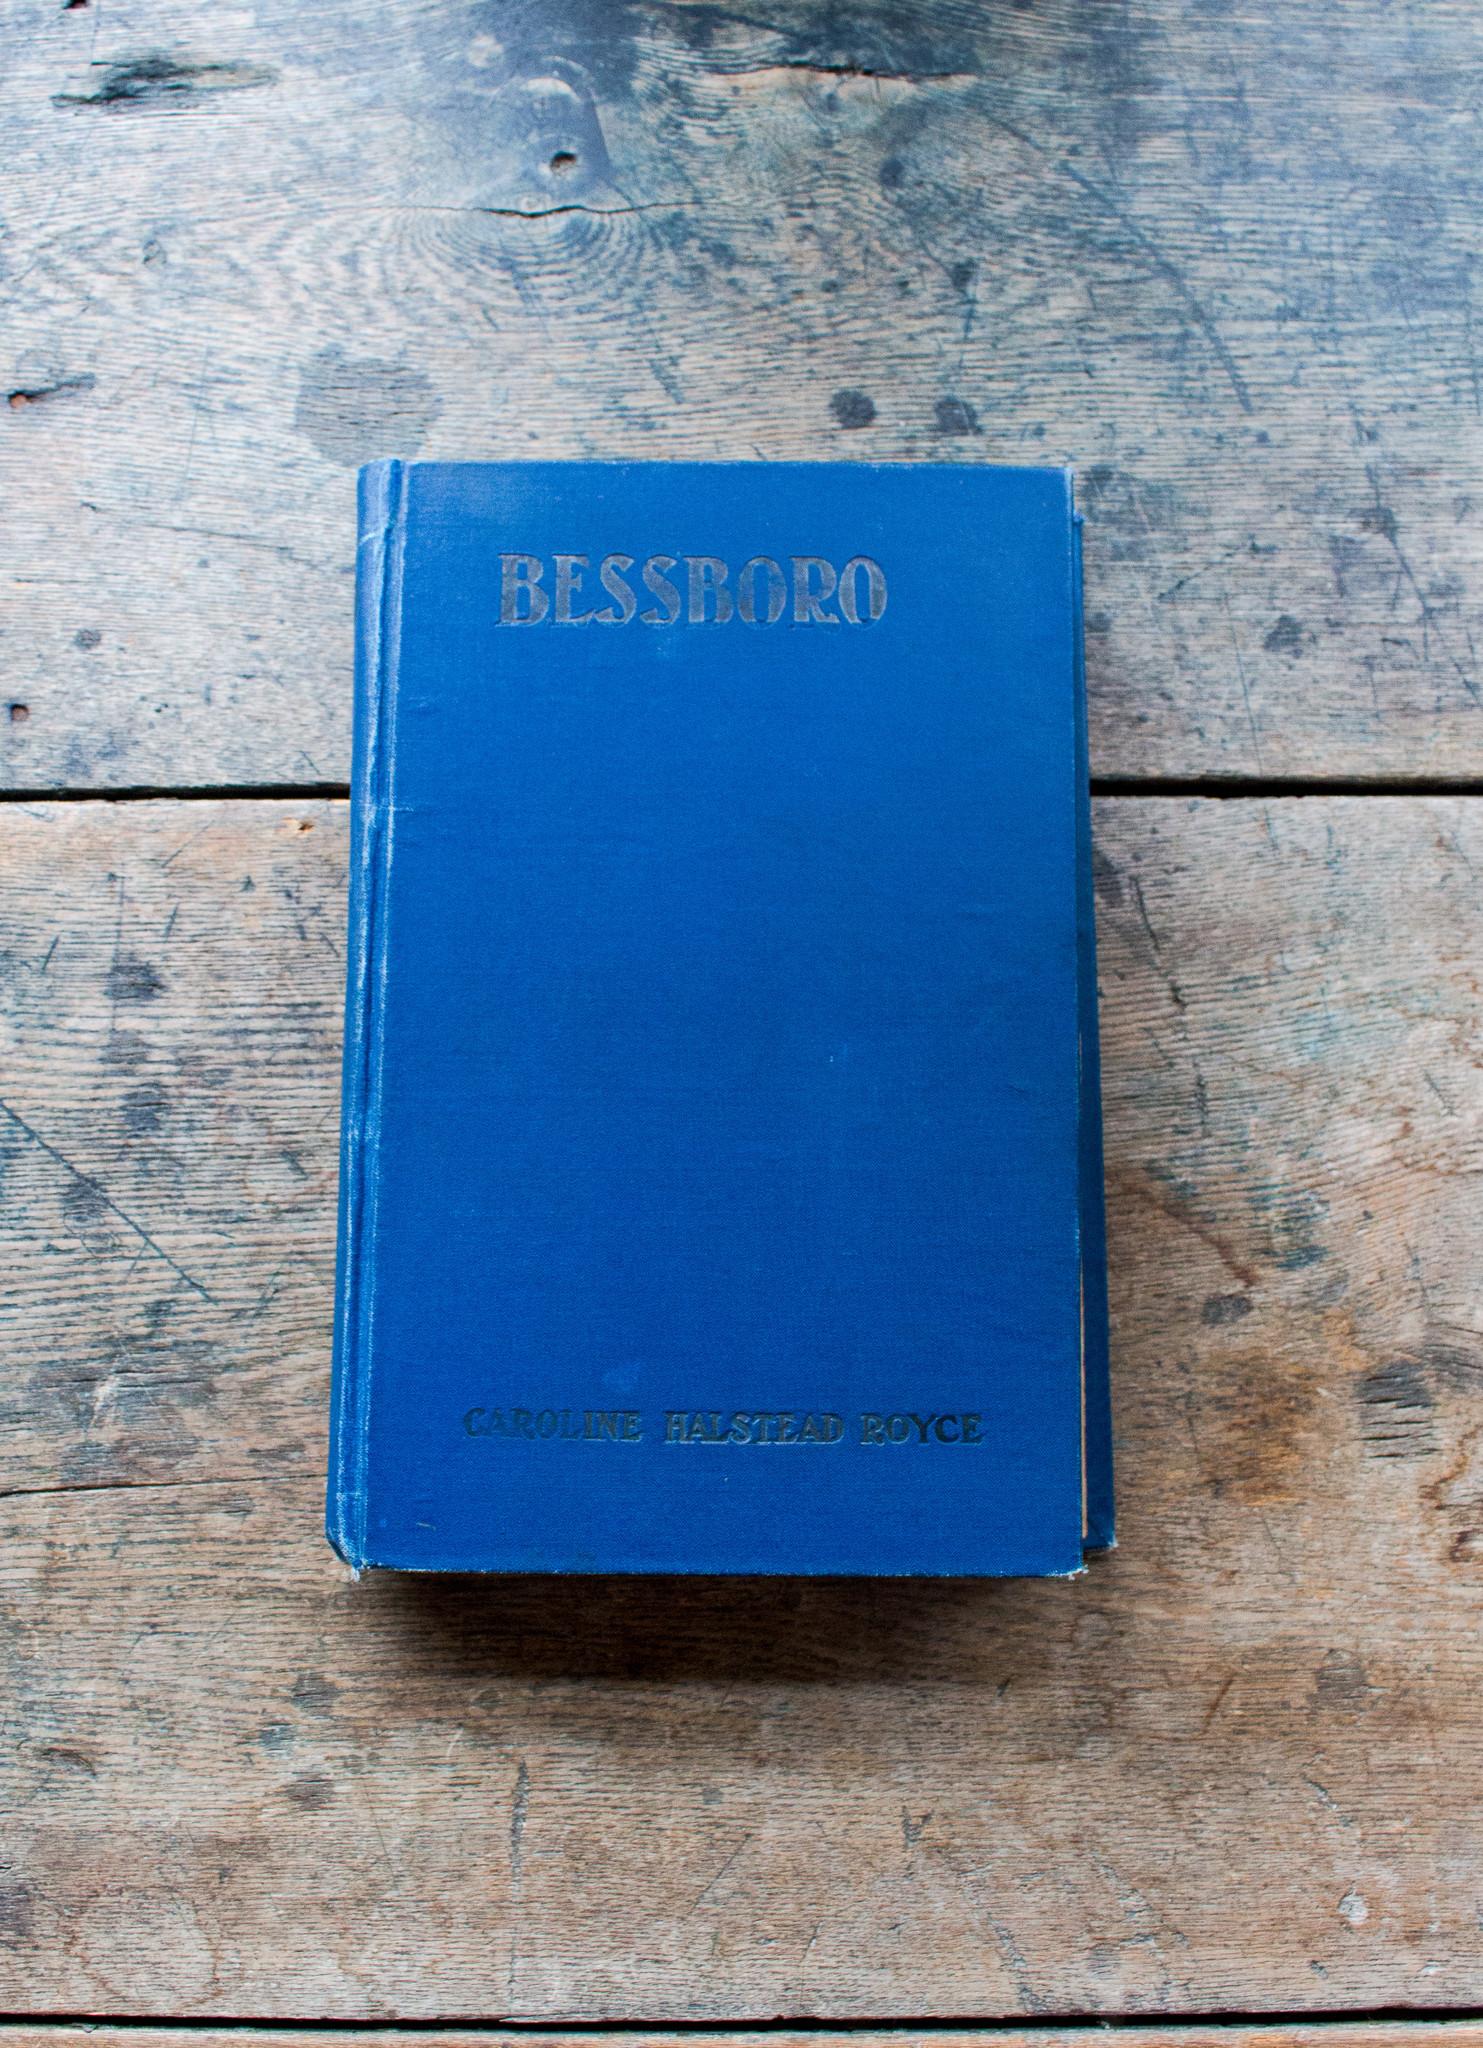 The Birch Store Bessboro, A History of Westport, 1904